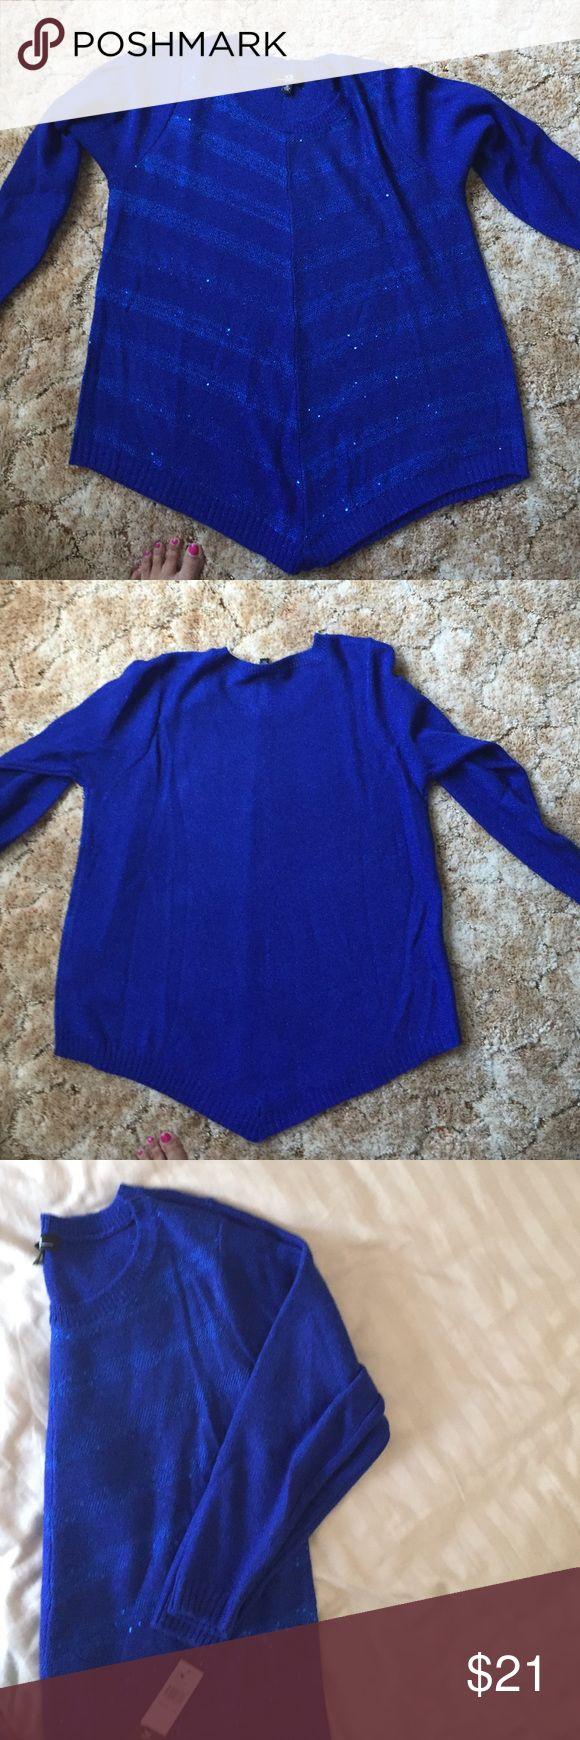 Beautiful royal blue sweater Beautiful royal blue sweater. Light shimmer effect AGB Sweaters